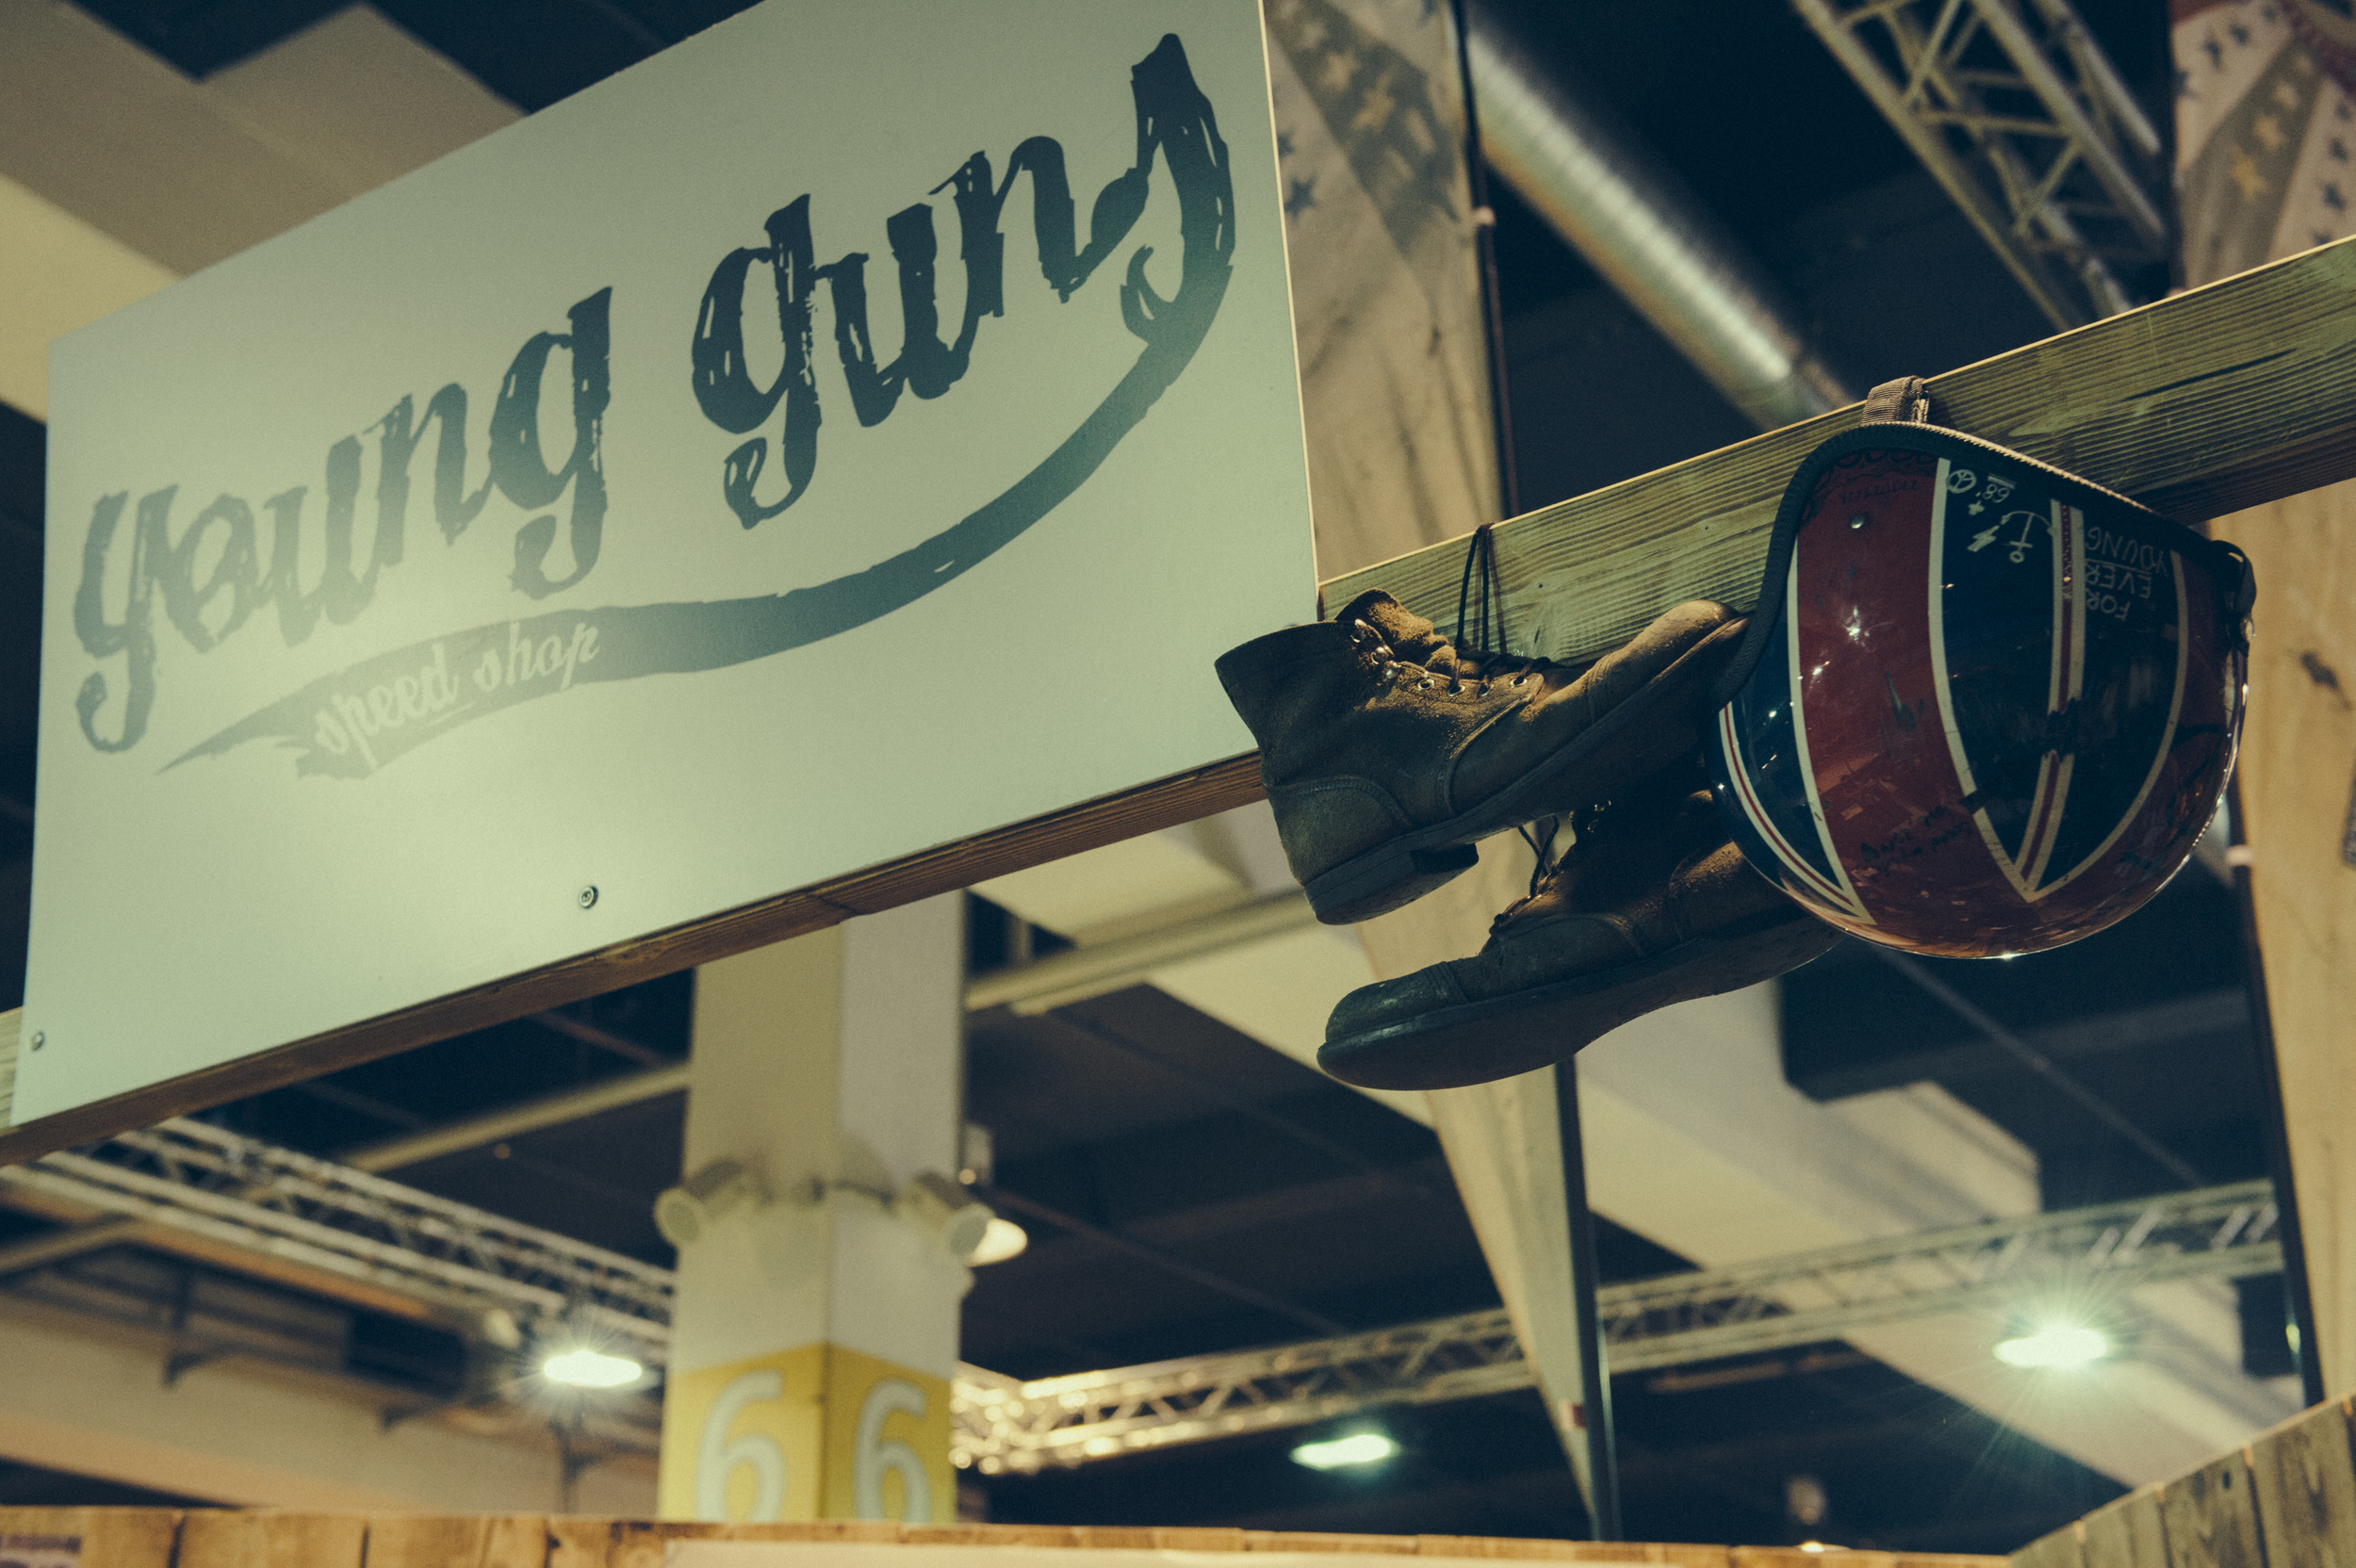 Young_Guns_Speedshop_Swissmoto2015_ByLorenzrichard.com-6462.jpg